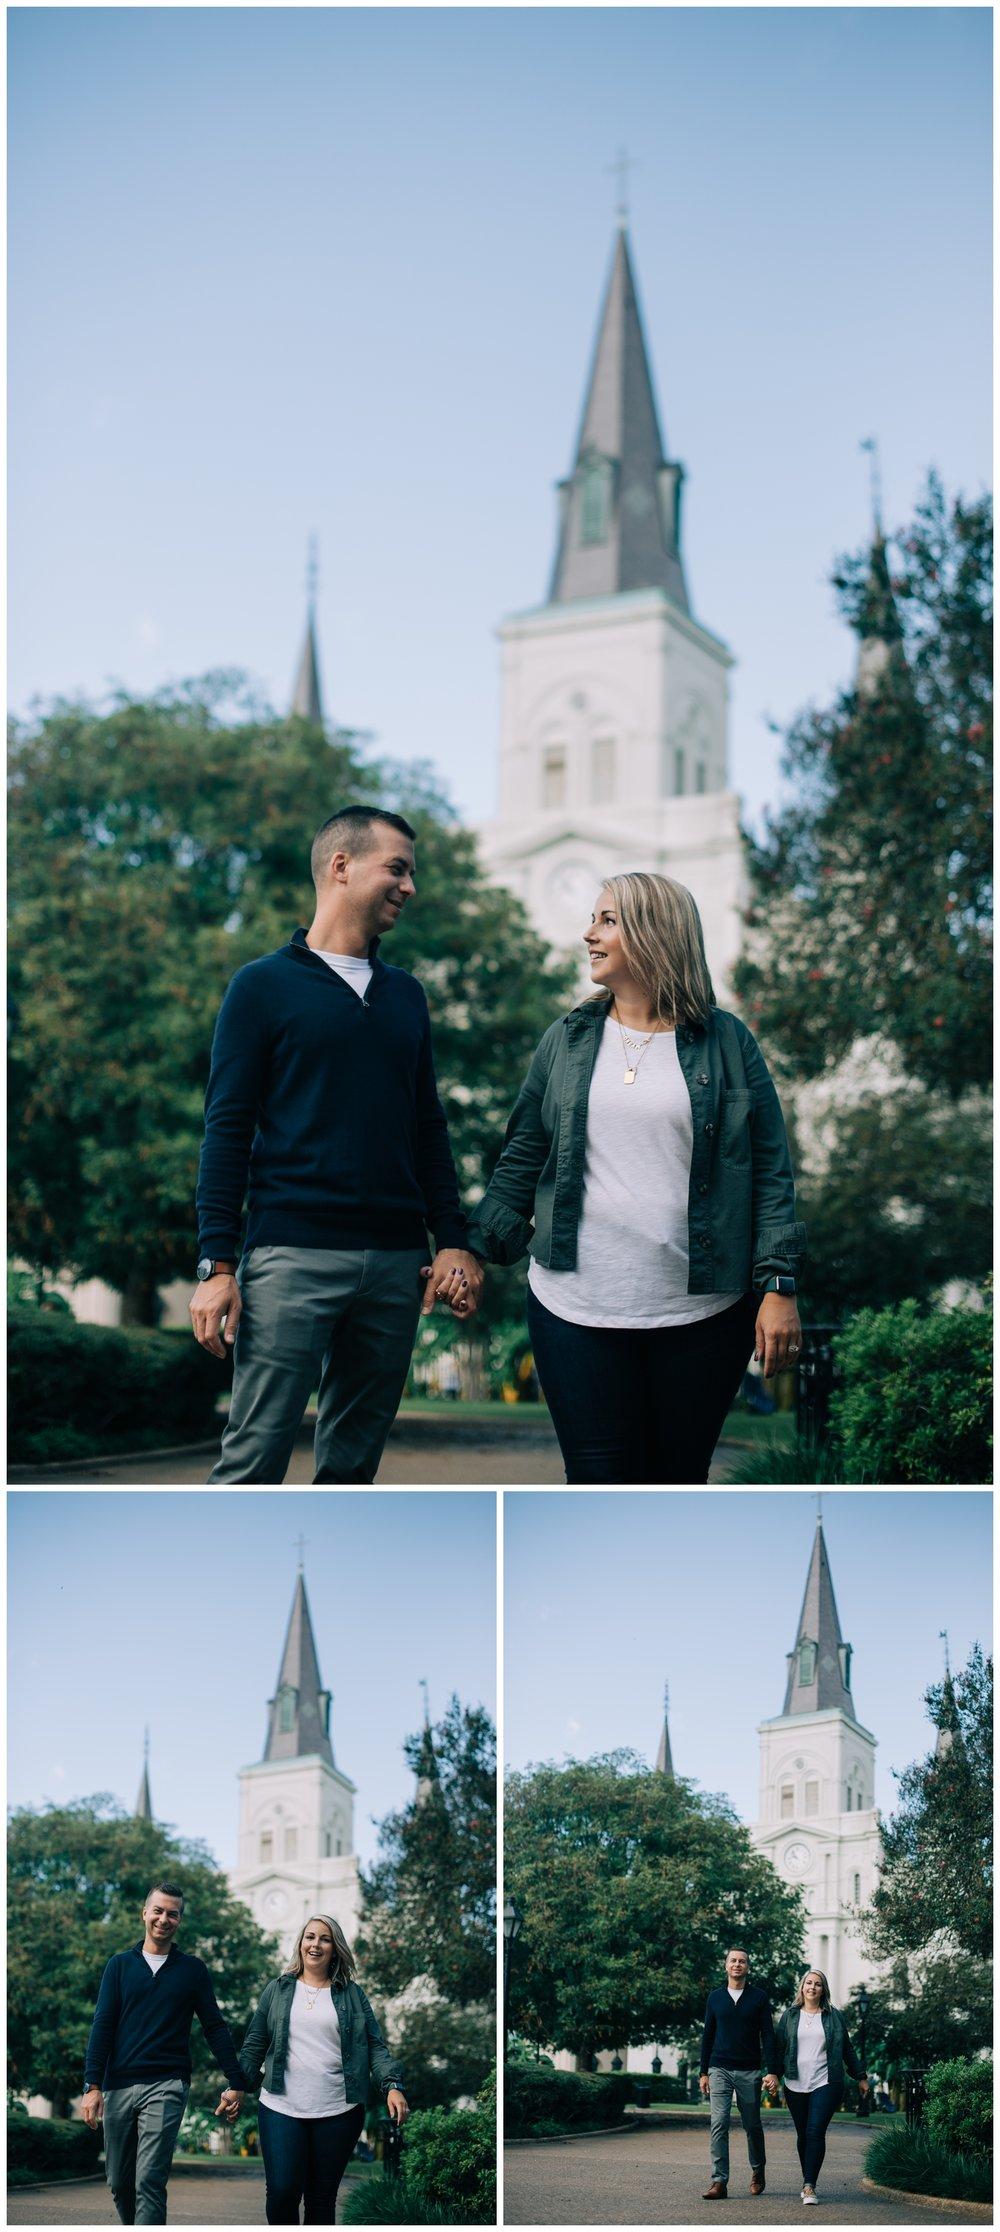 New-Orleans-Engagement-photos- French-Quarter-kallistia-photography_0008.jpg